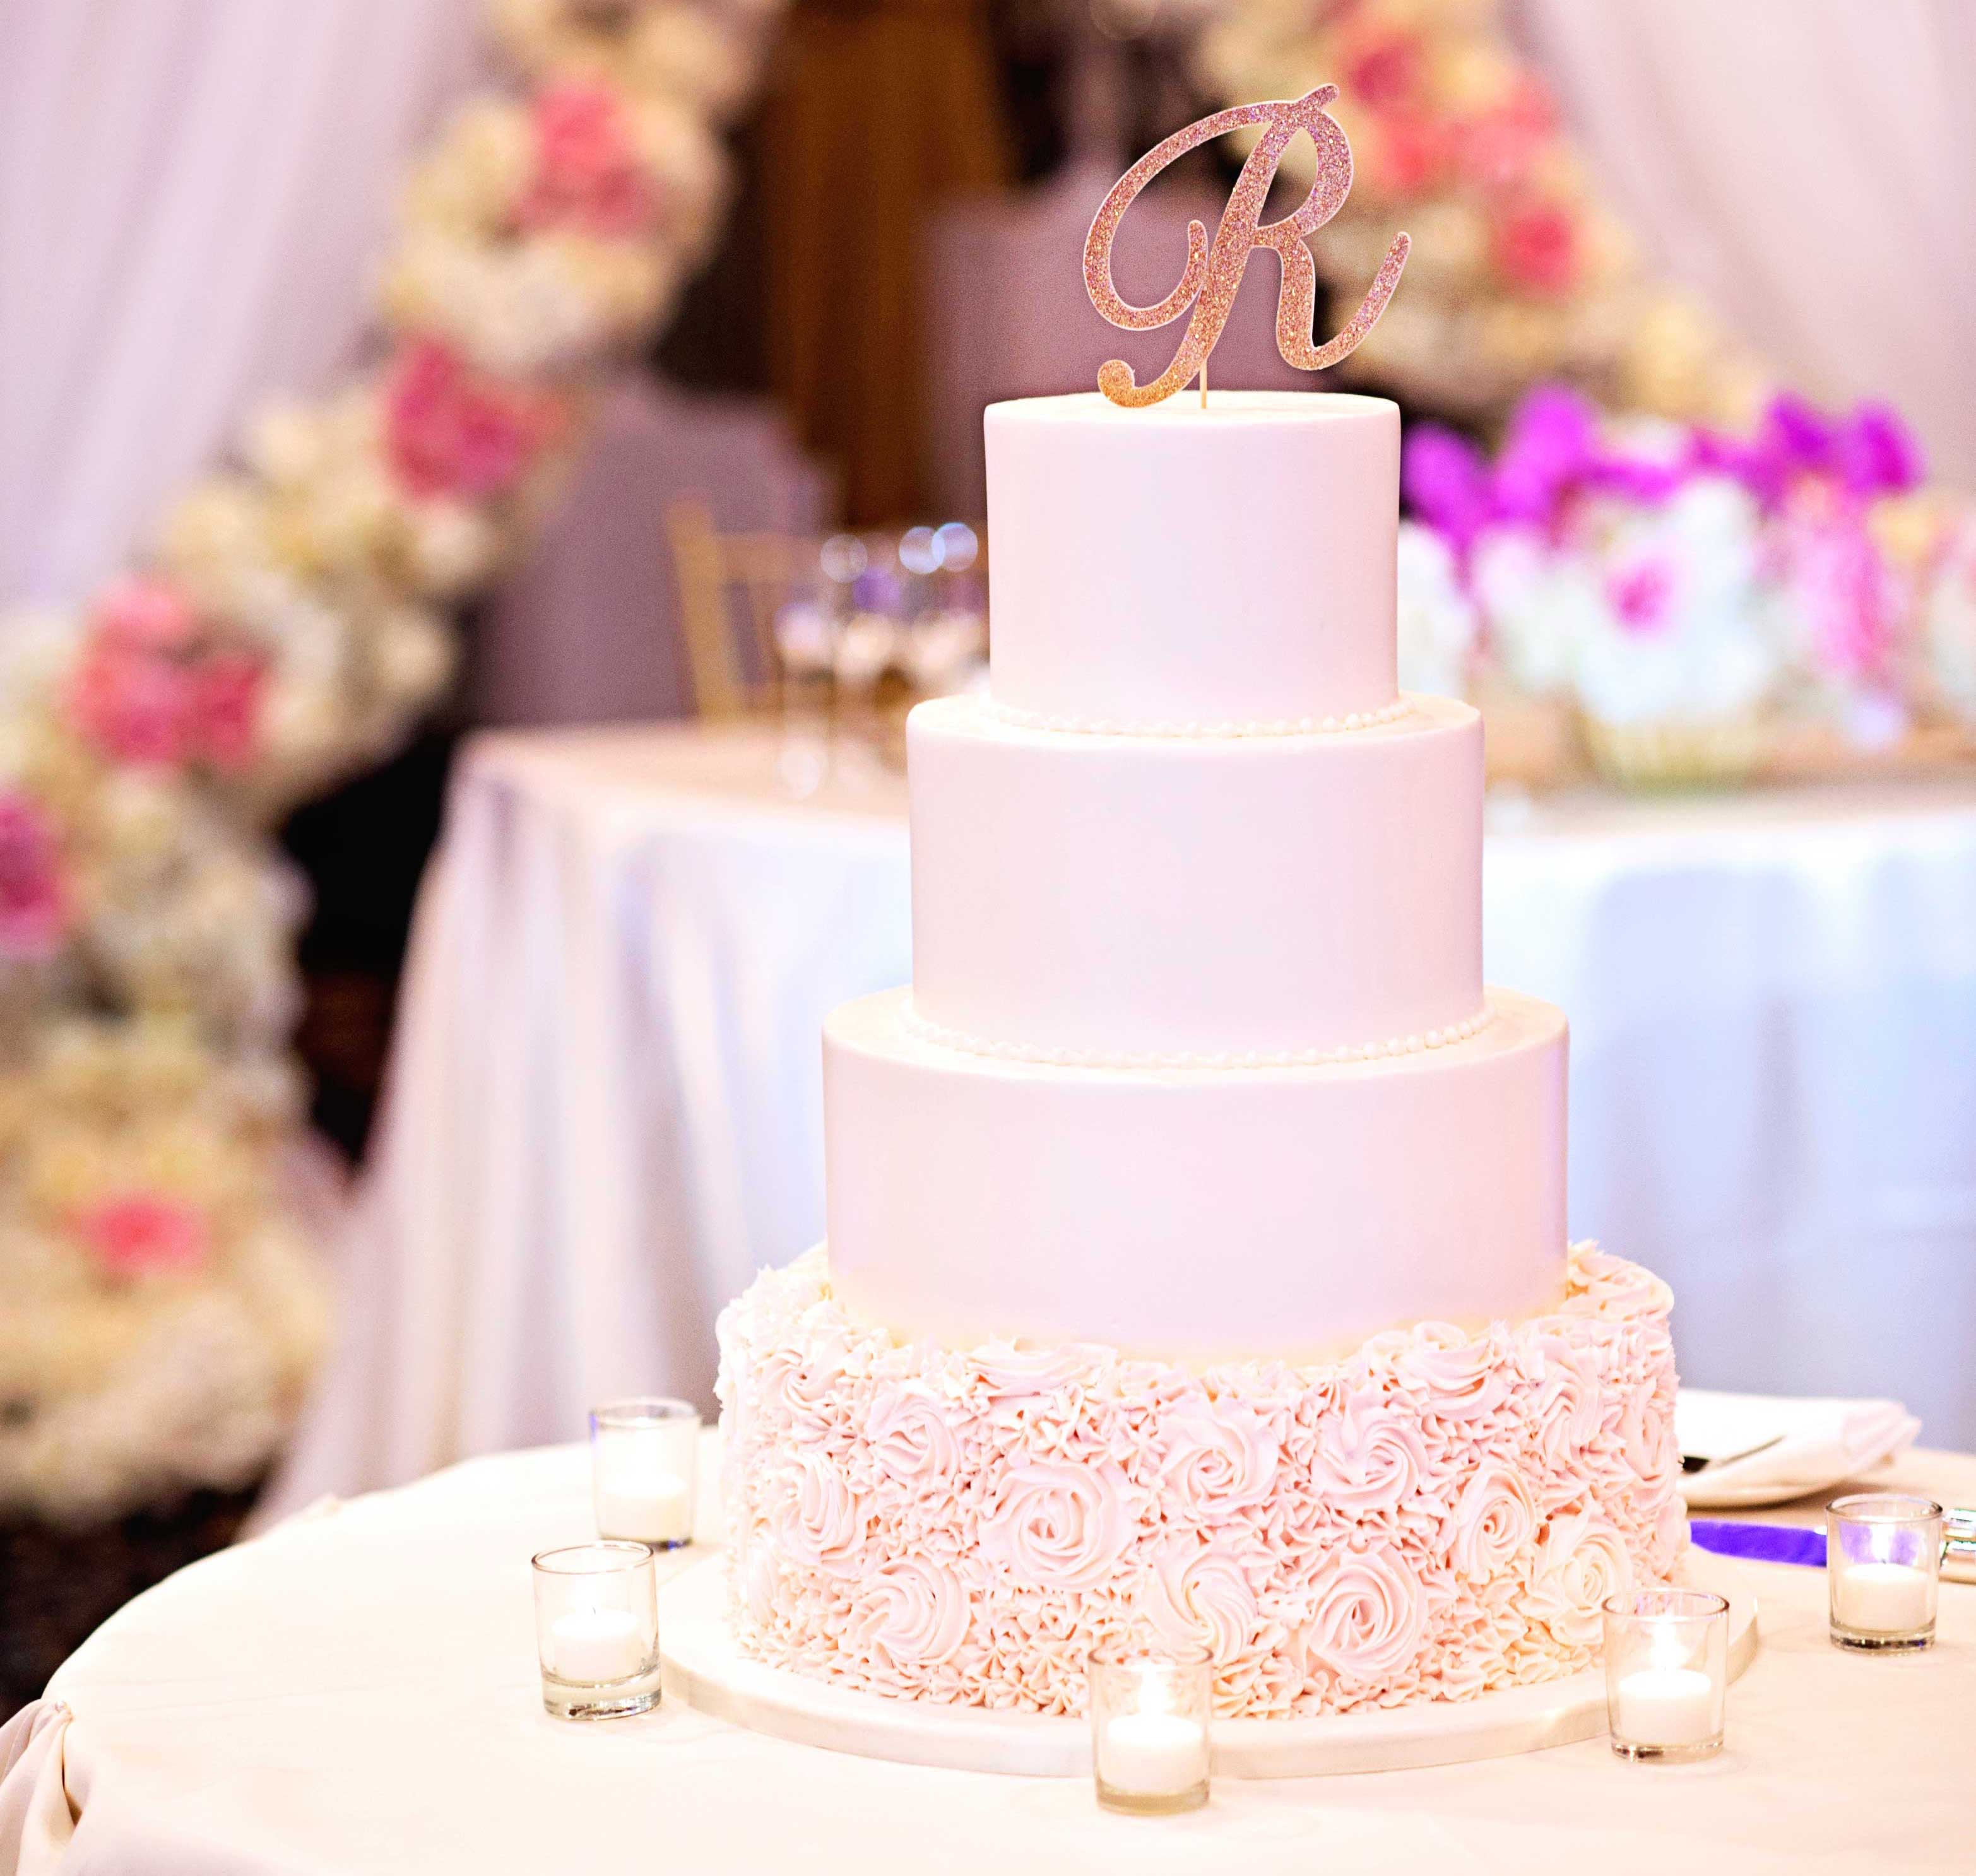 White wedding cake with flower design on bottom layer